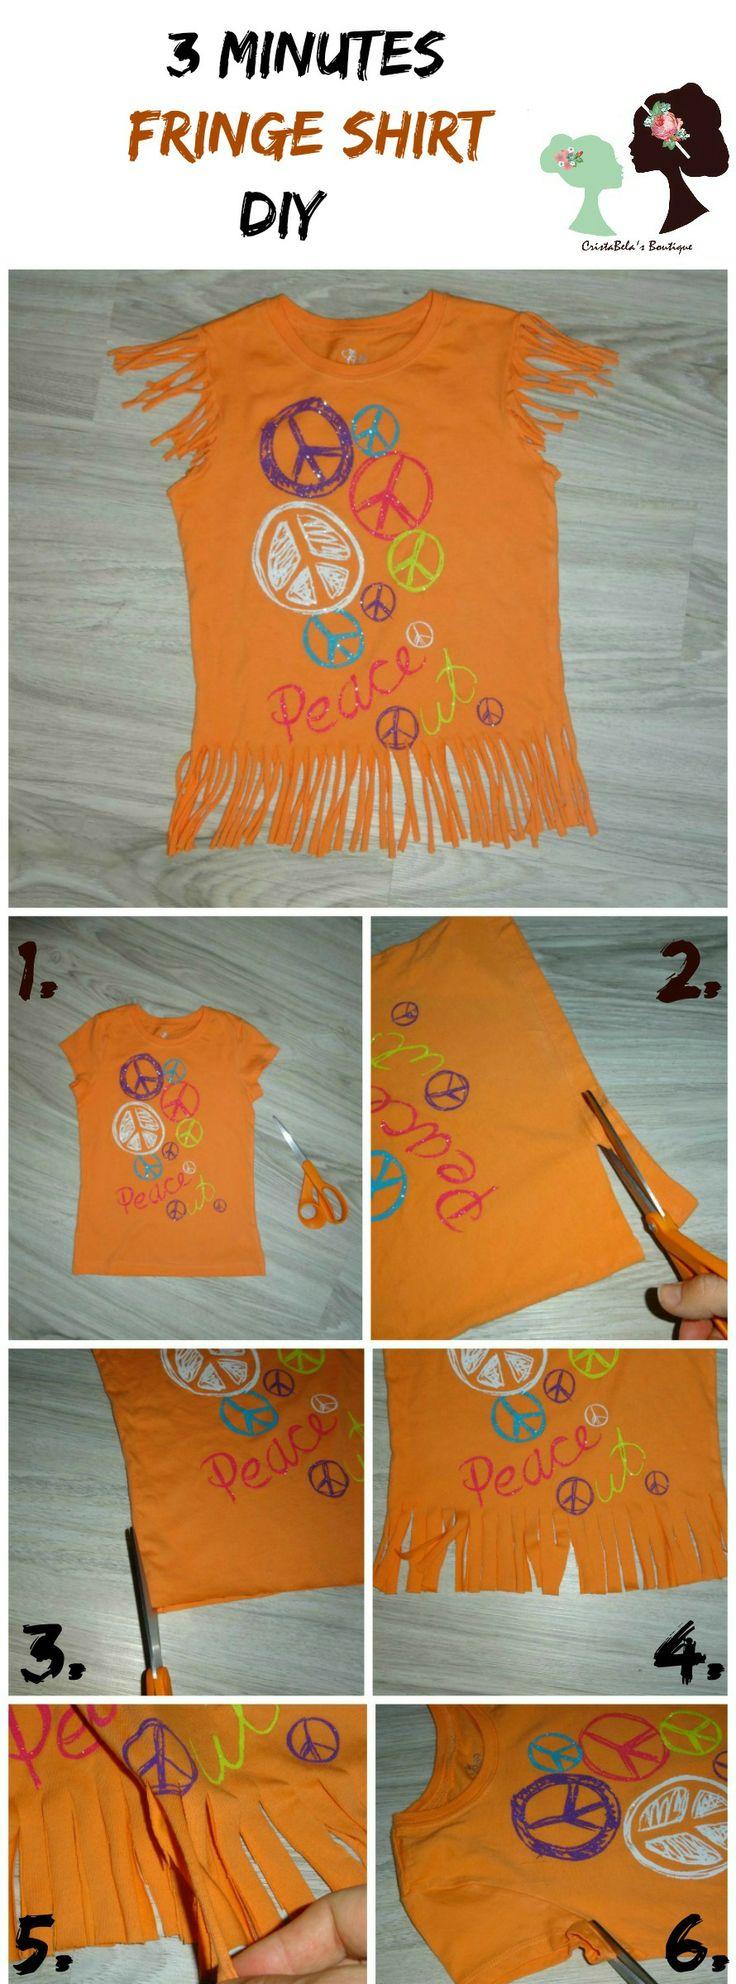 3 Minutes Fringe Shirt DIY,easy Fringe shirt DIY